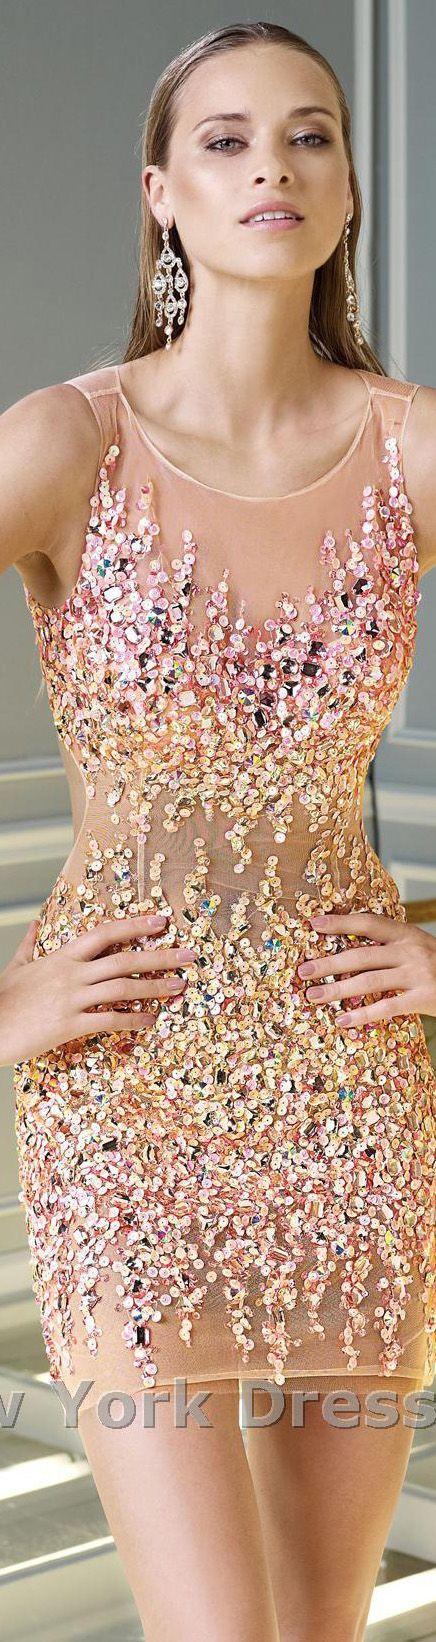 Alyce Paris ~ Bejeweled Nude Cocktail Dress